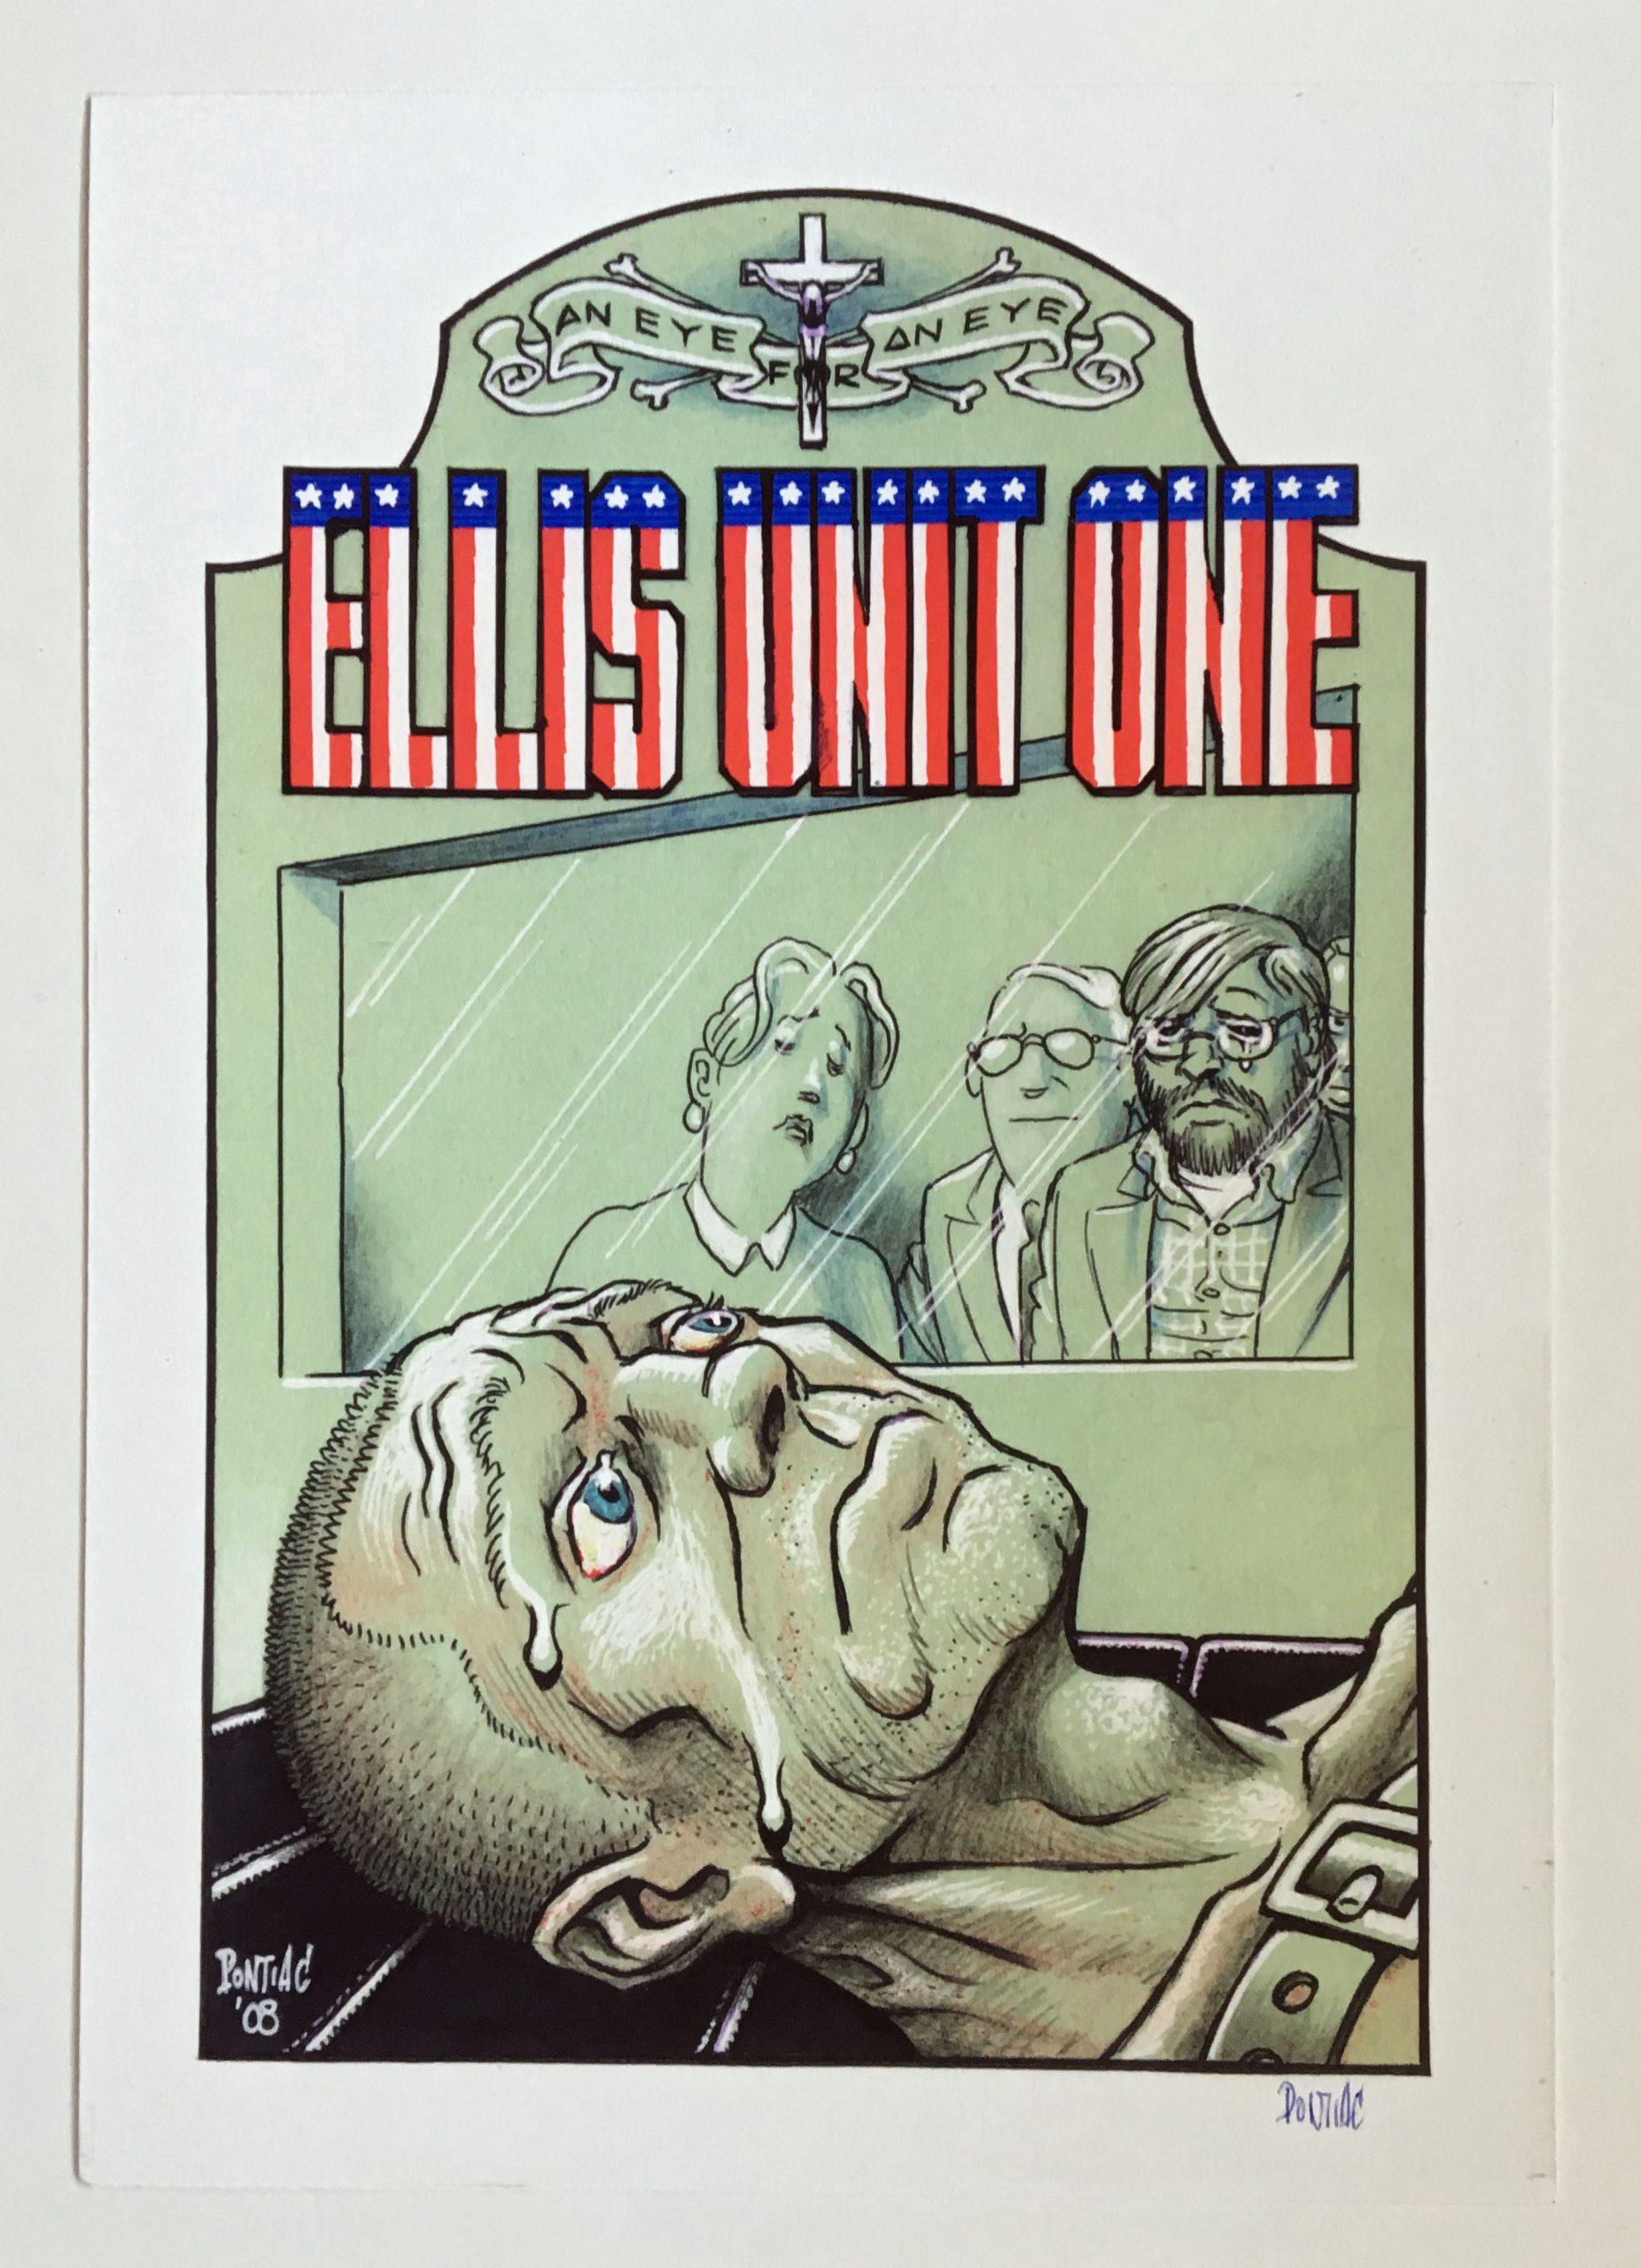 Ellis Unit One